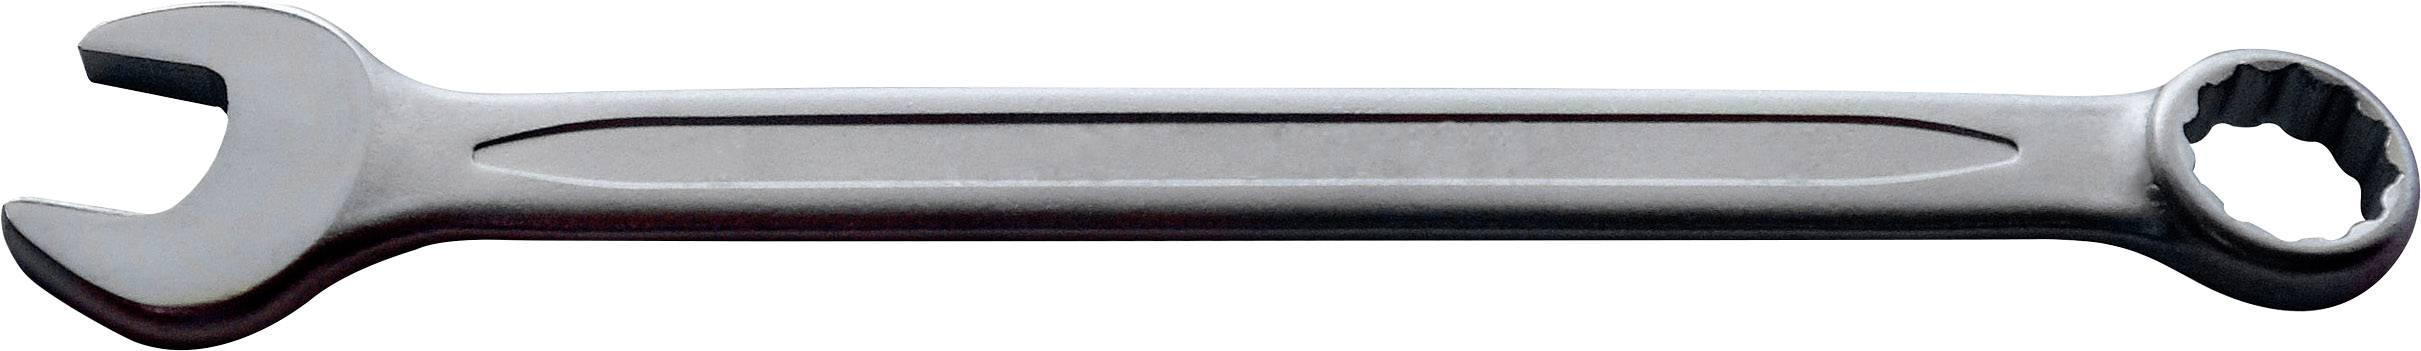 Očkoplochý klíč TOOLCRAFT 820834, N/A, 10 mm